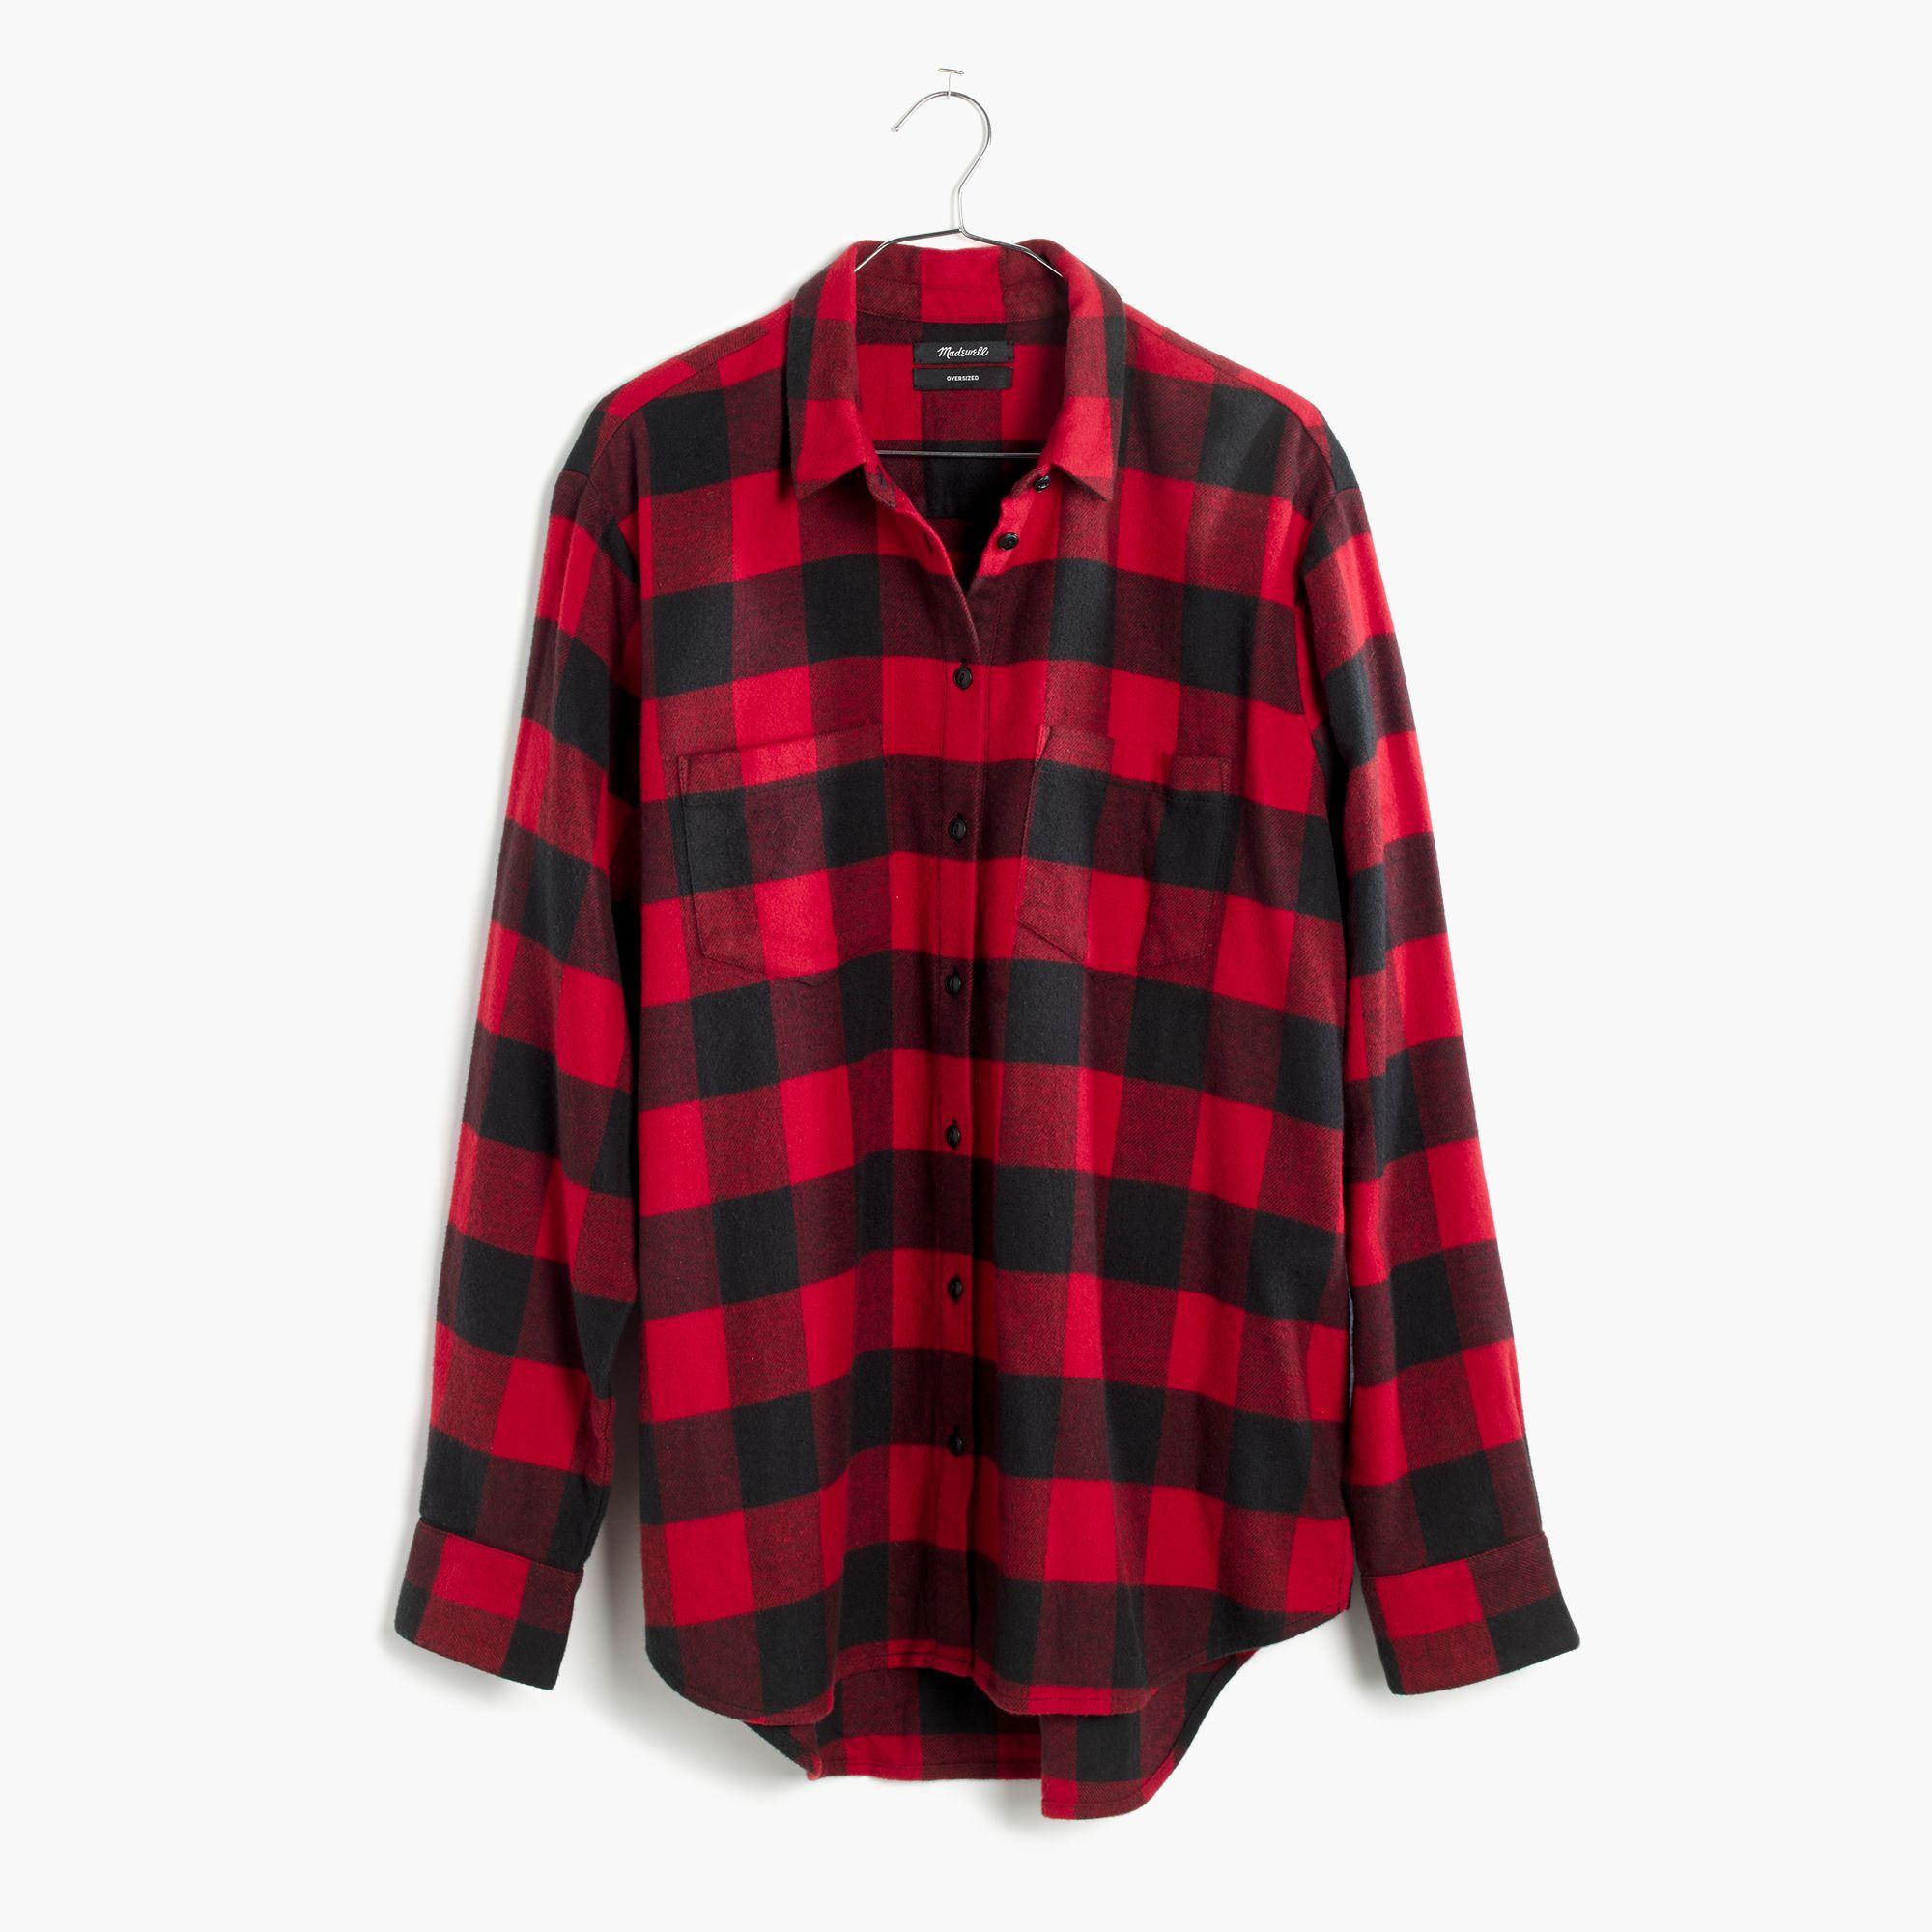 Madewell Flannel Oversized Ex Boyfriend Shirt In Buffalo